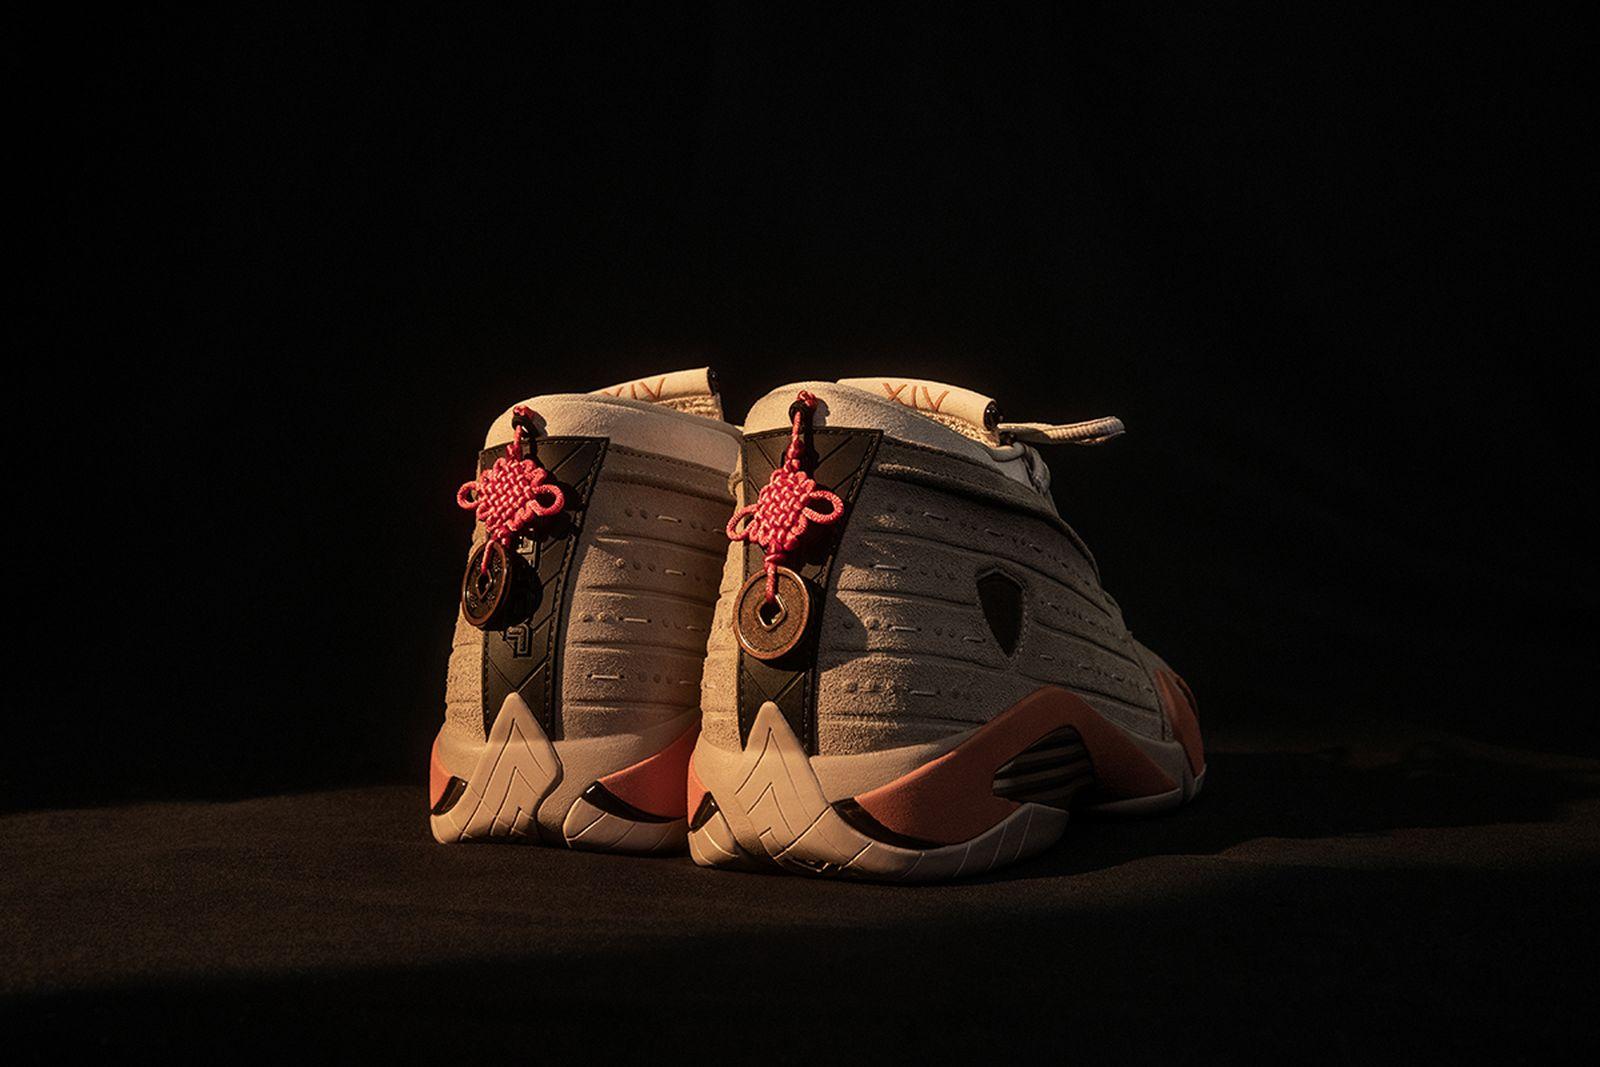 clot-air-jordan-14-low-terracotta-release-info-06